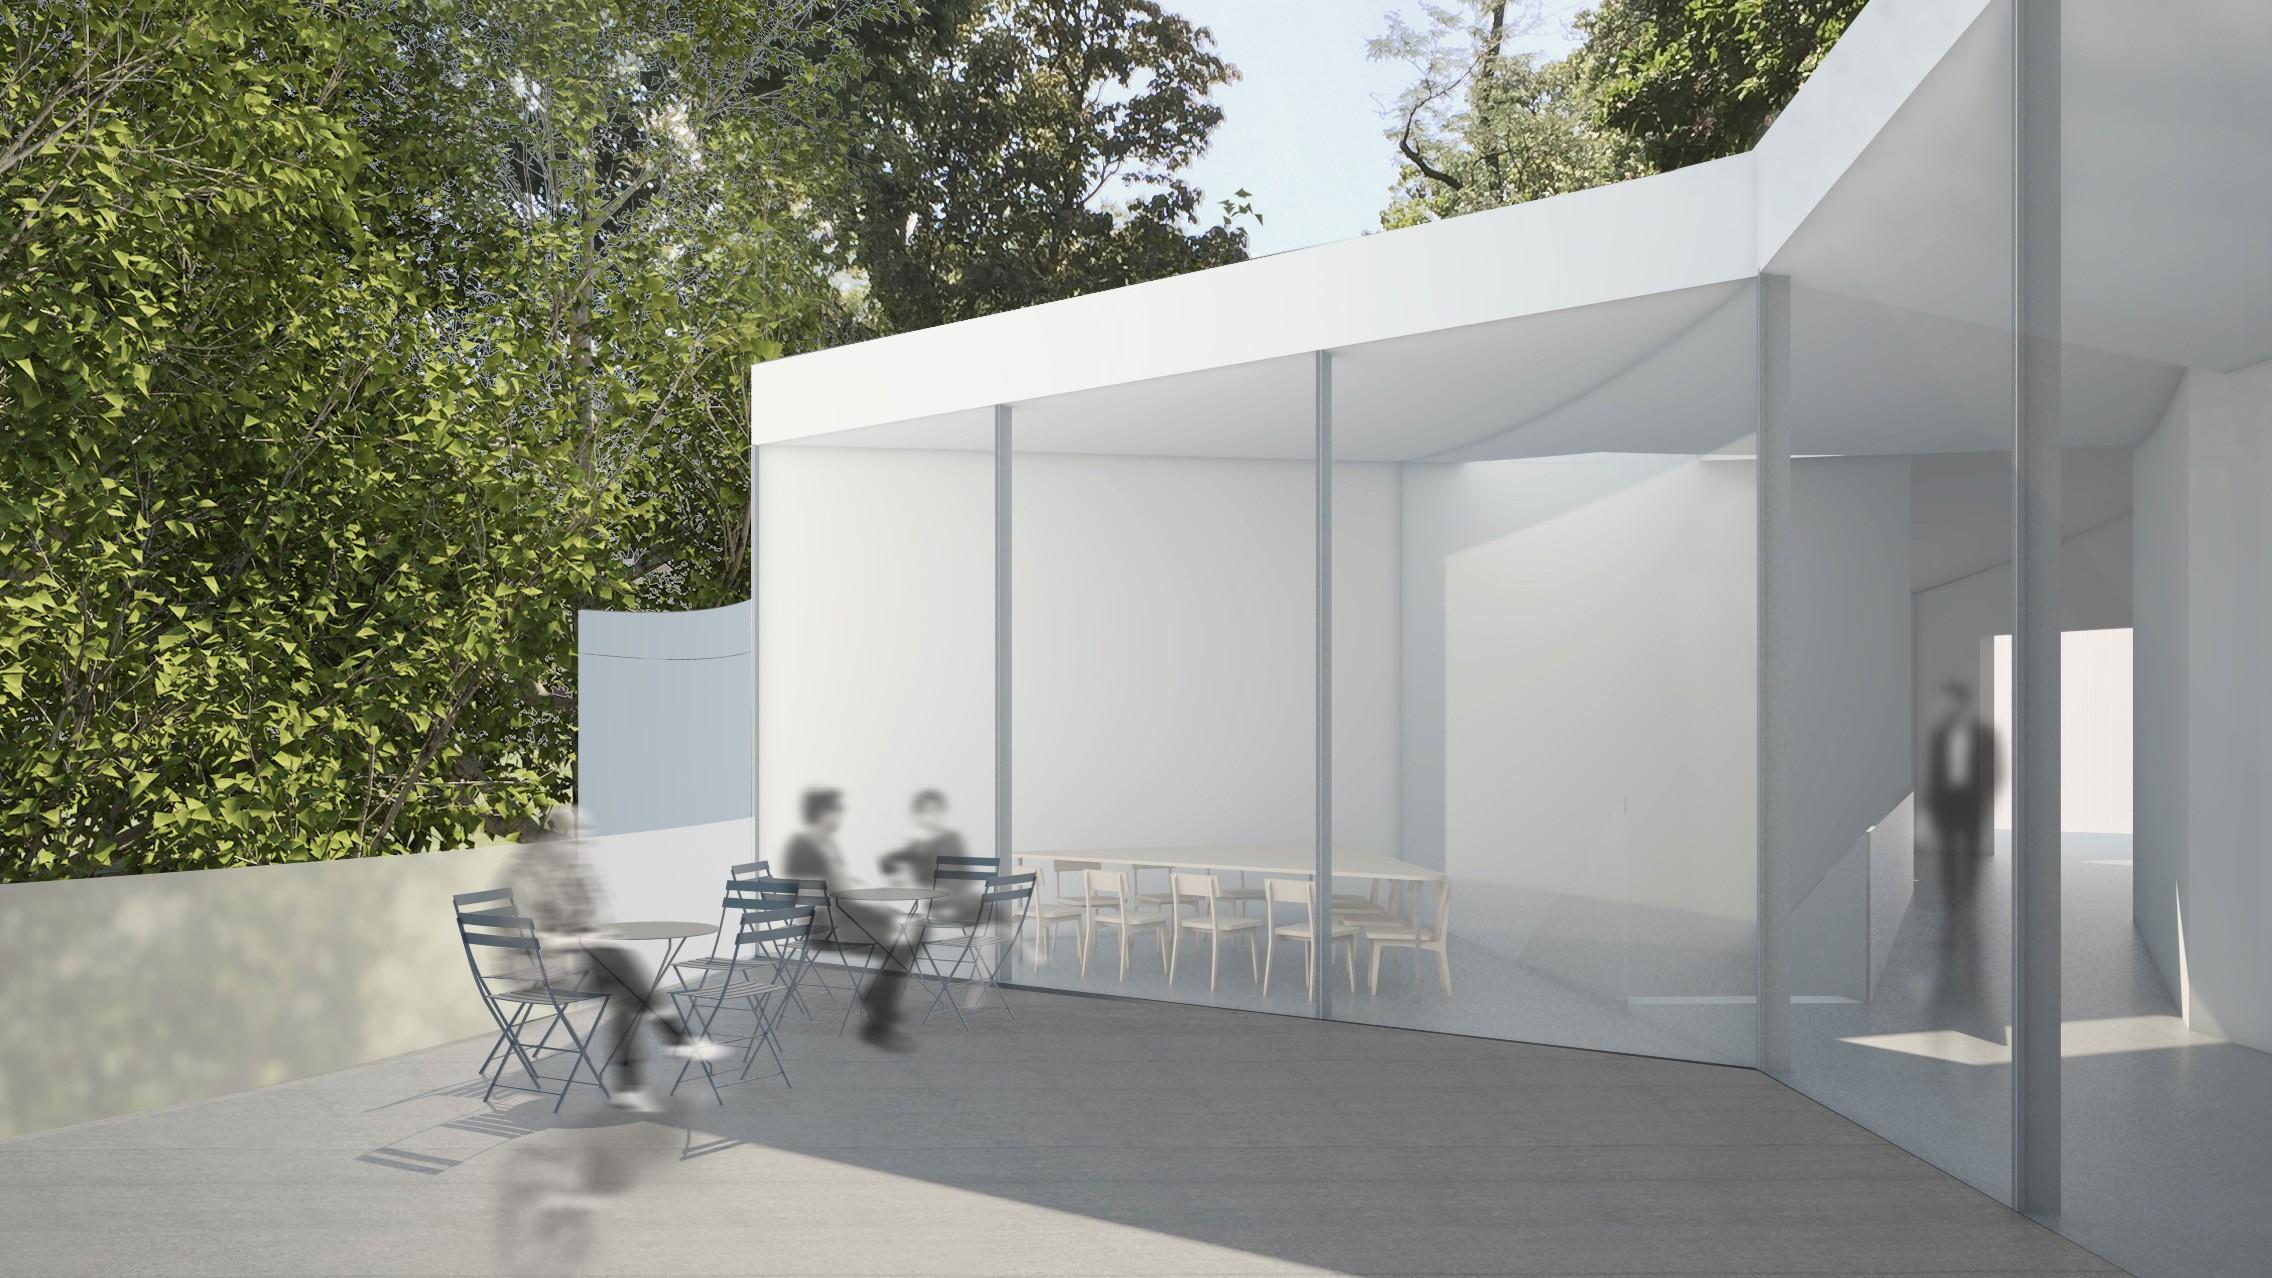 https://stevenholl.sfo2.digitaloceanspaces.com/uploads/projects/project-images/StevenHollArchitects_F&M_Balcony_WH.jpg